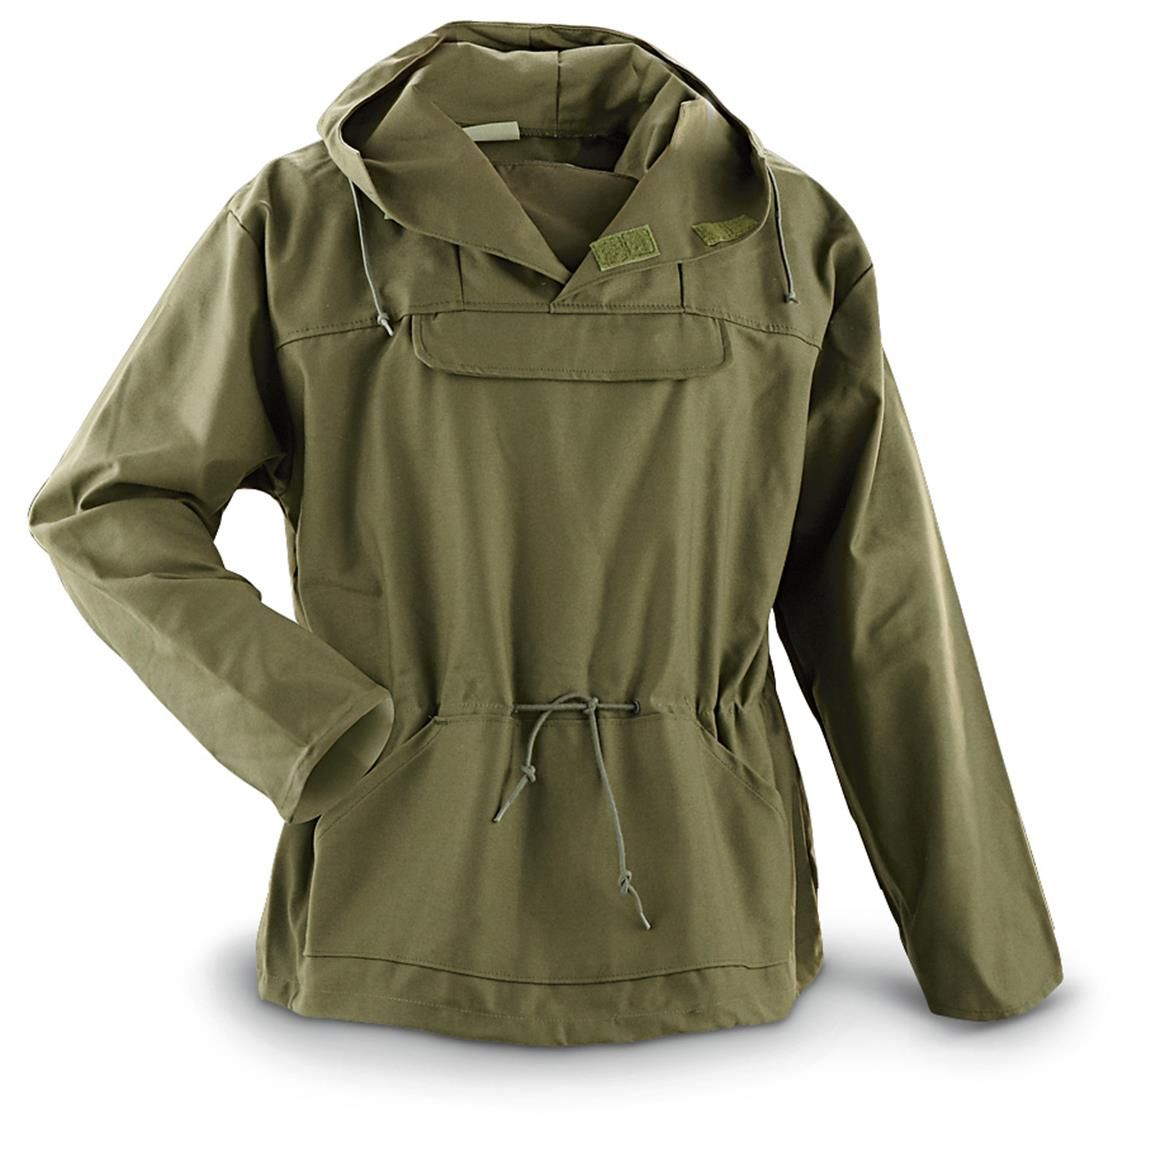 New U.S. Military Surplus Anorak Field Jacket a46eca000